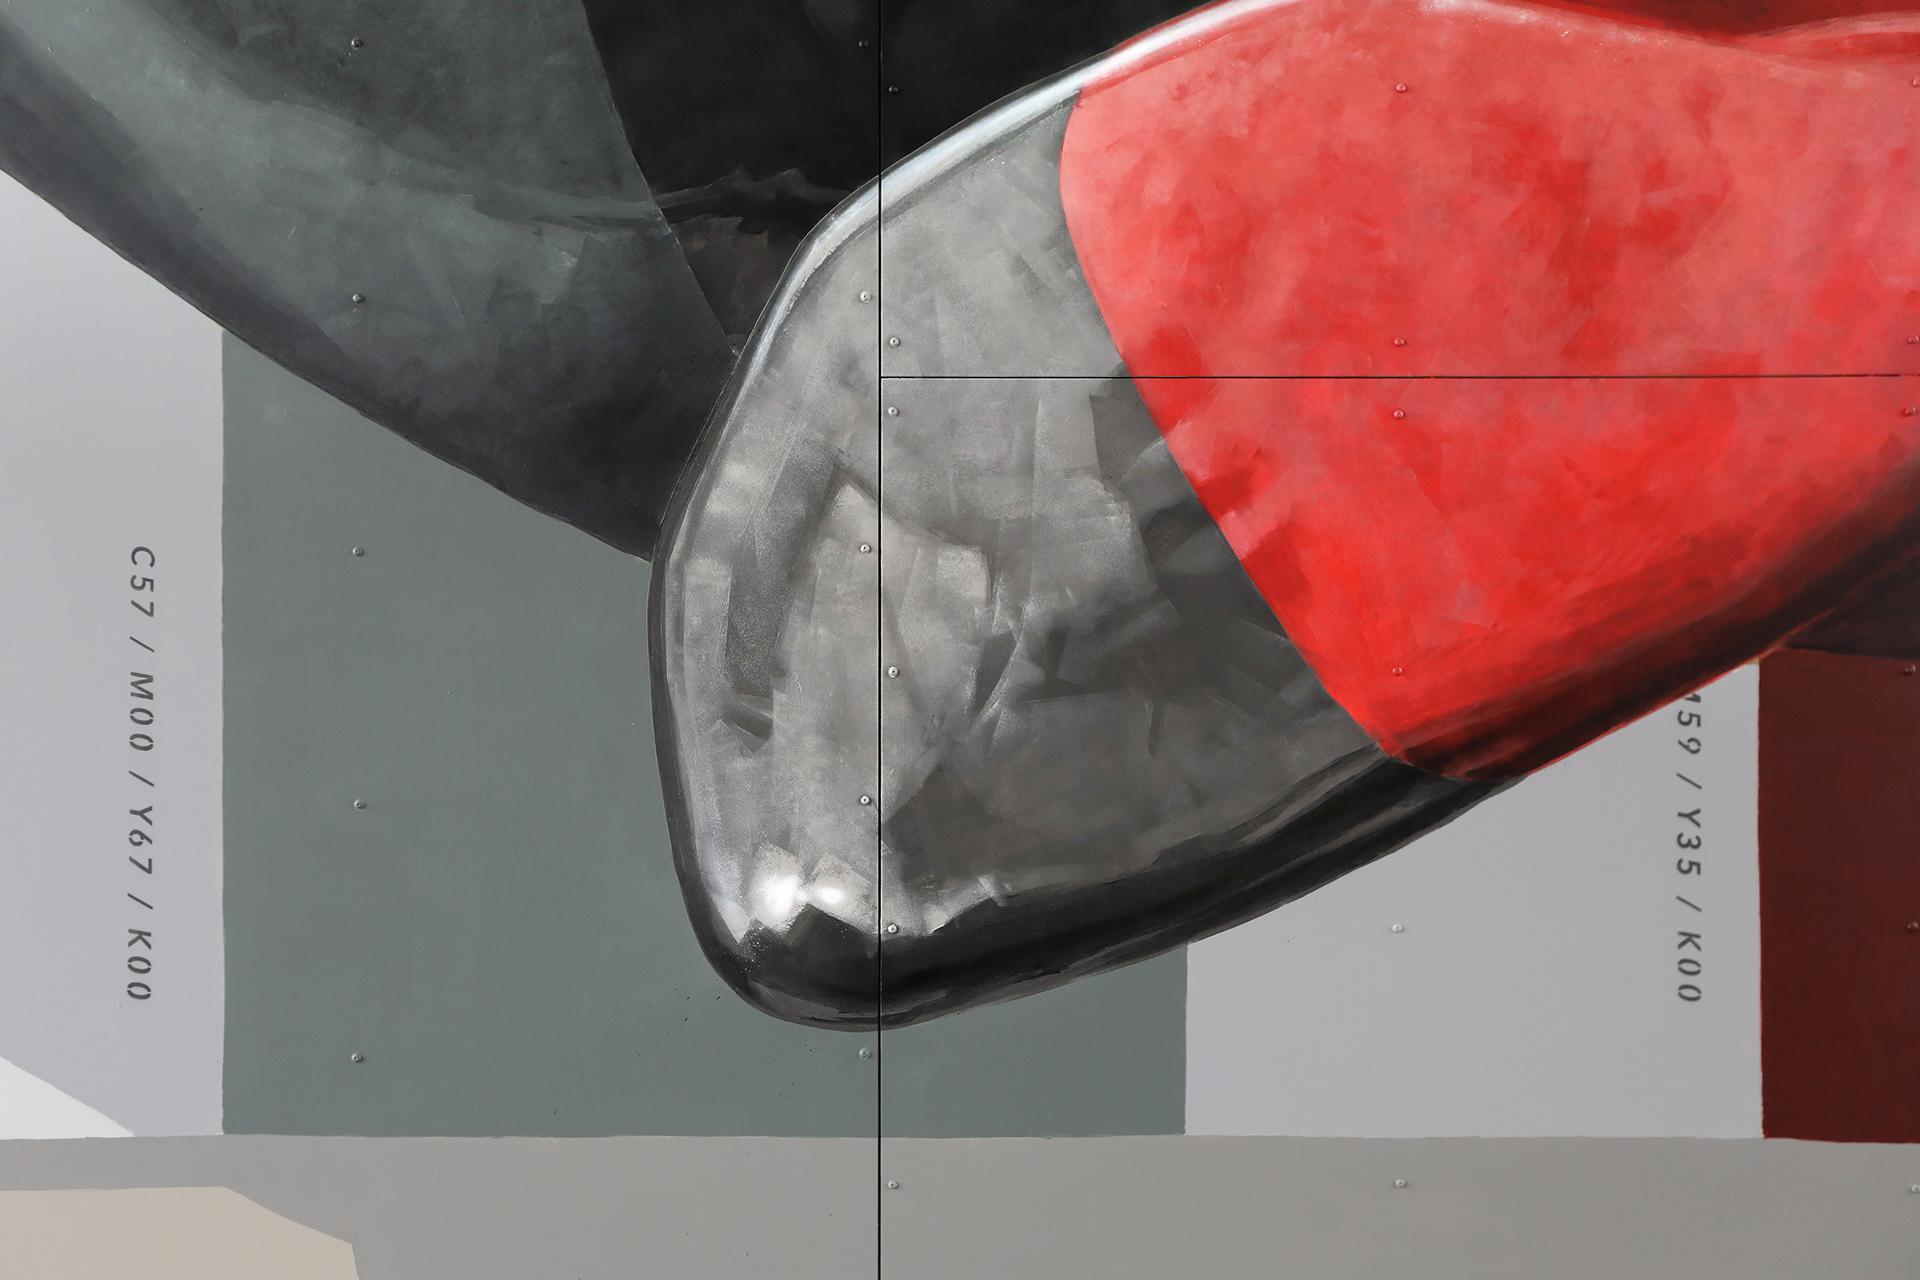 Nuances selection | Collater.al